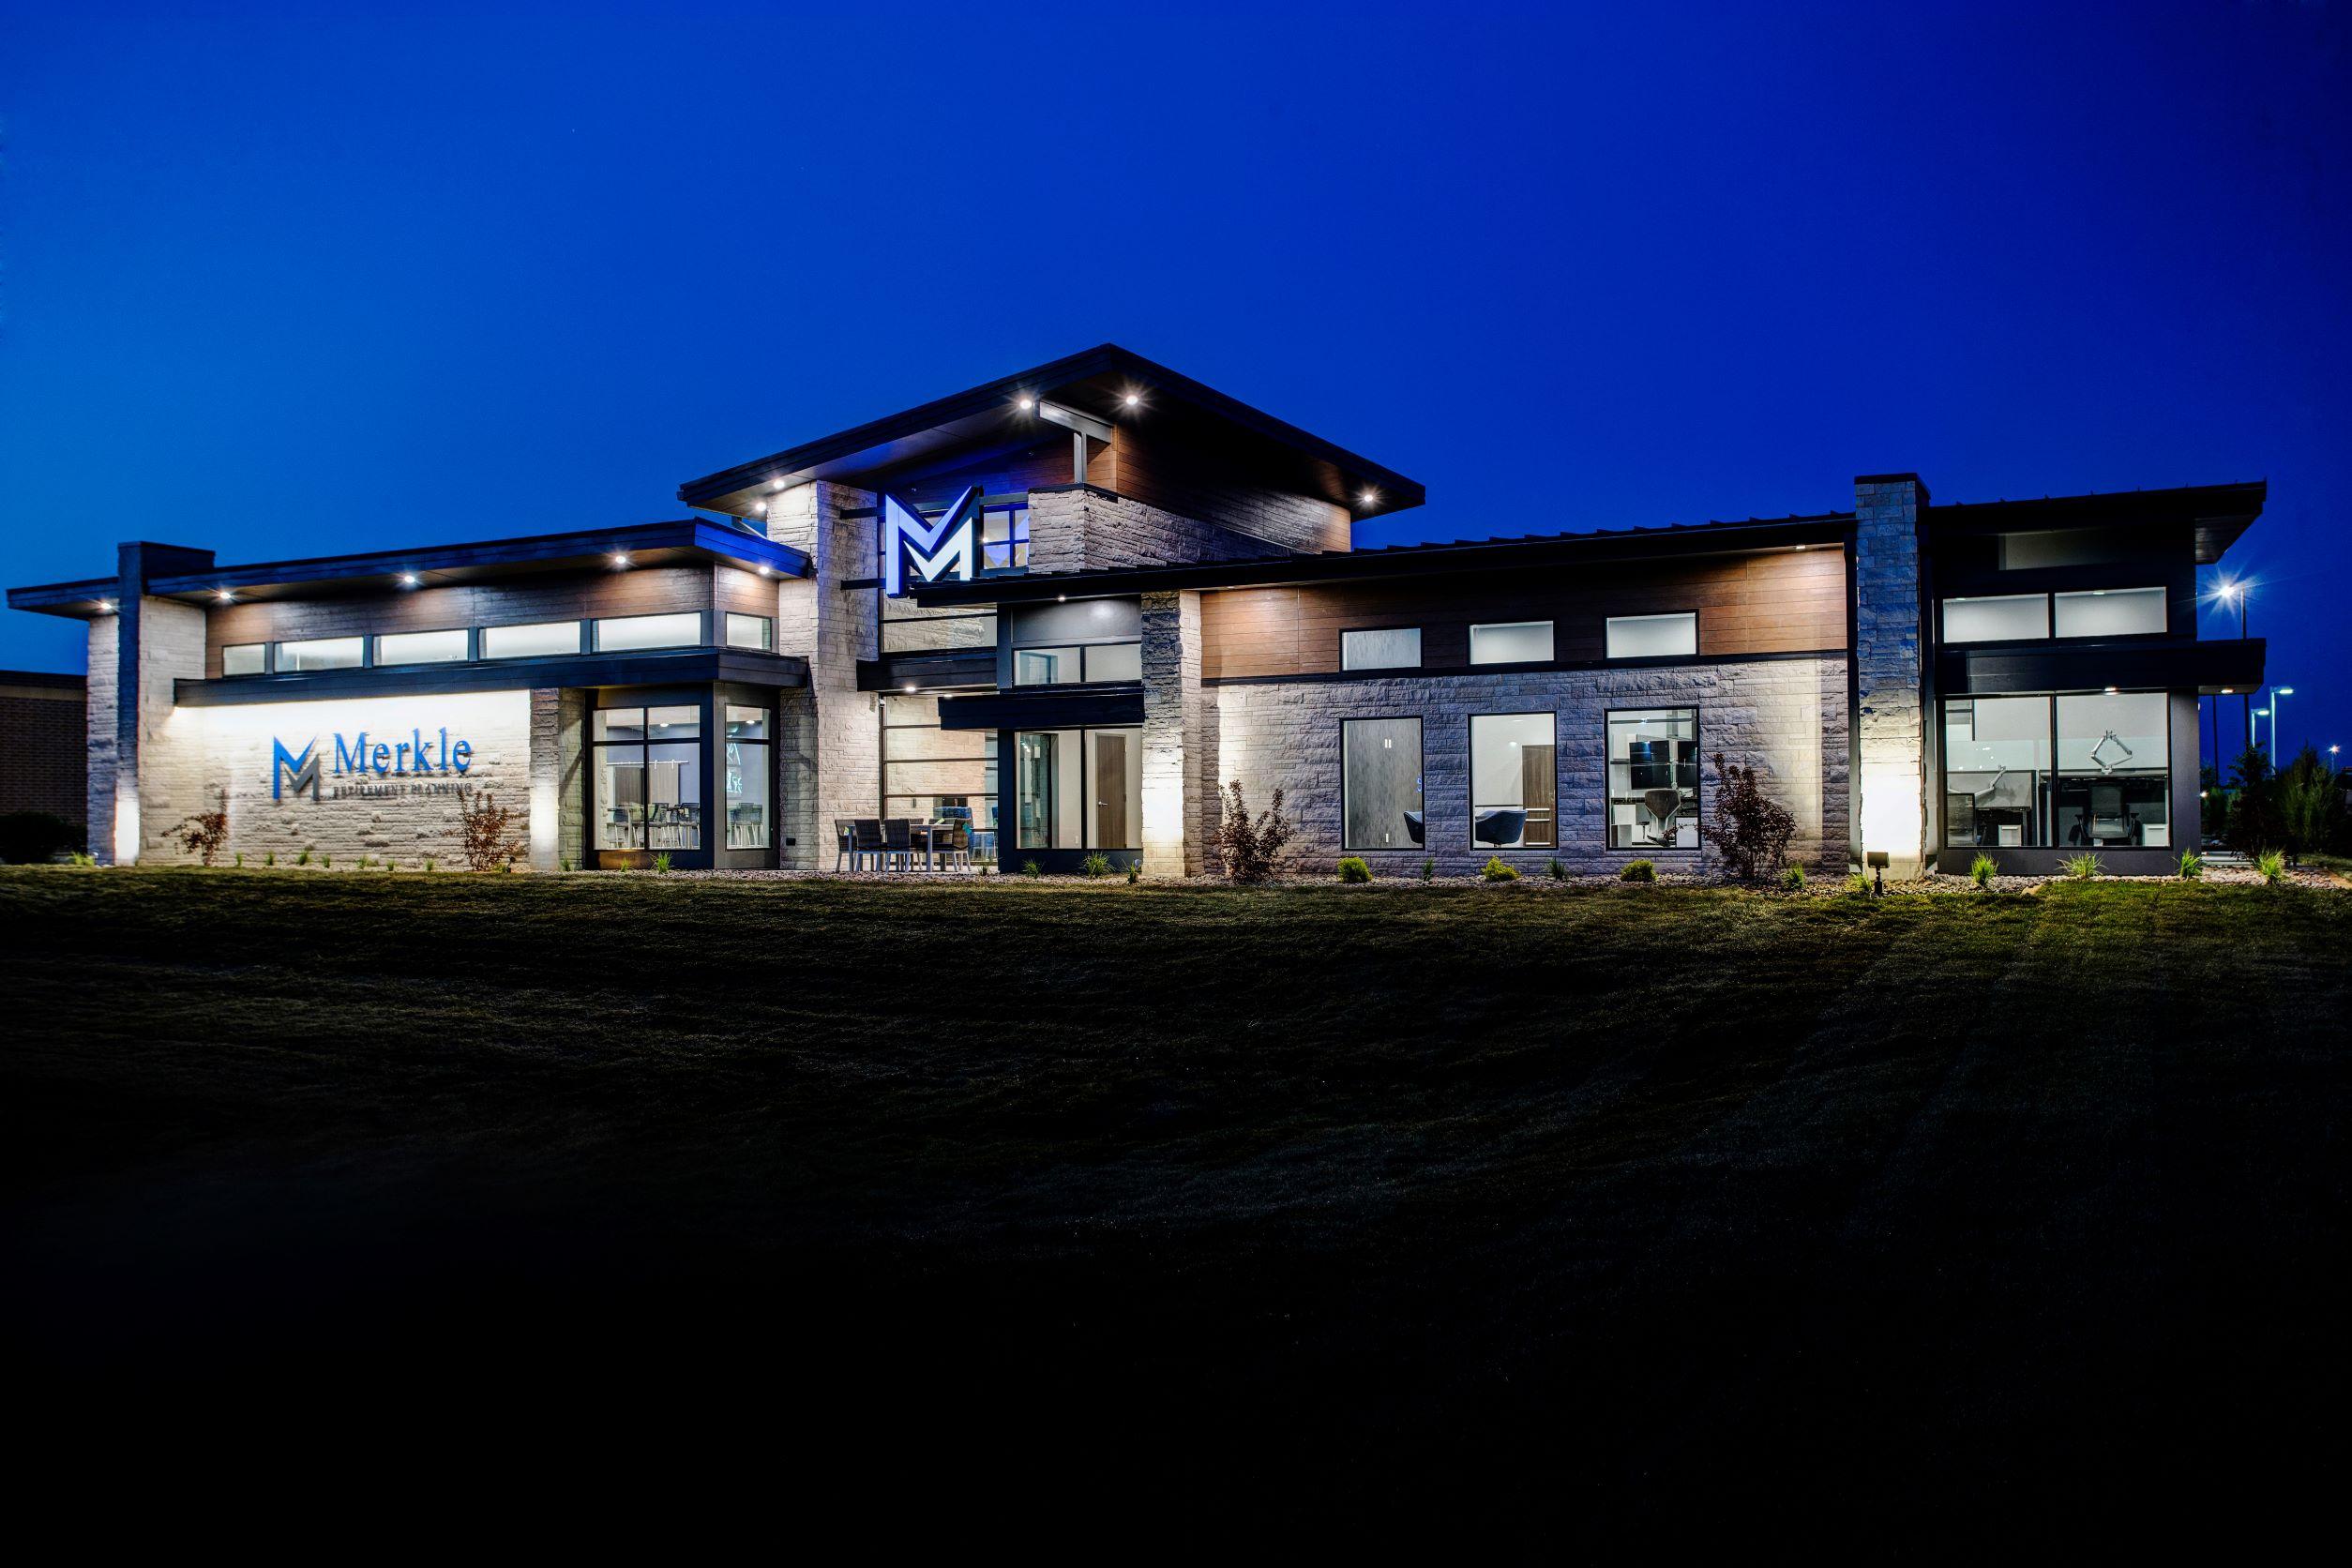 Merkle Retirement Planning Exterior | JCorp, Inc